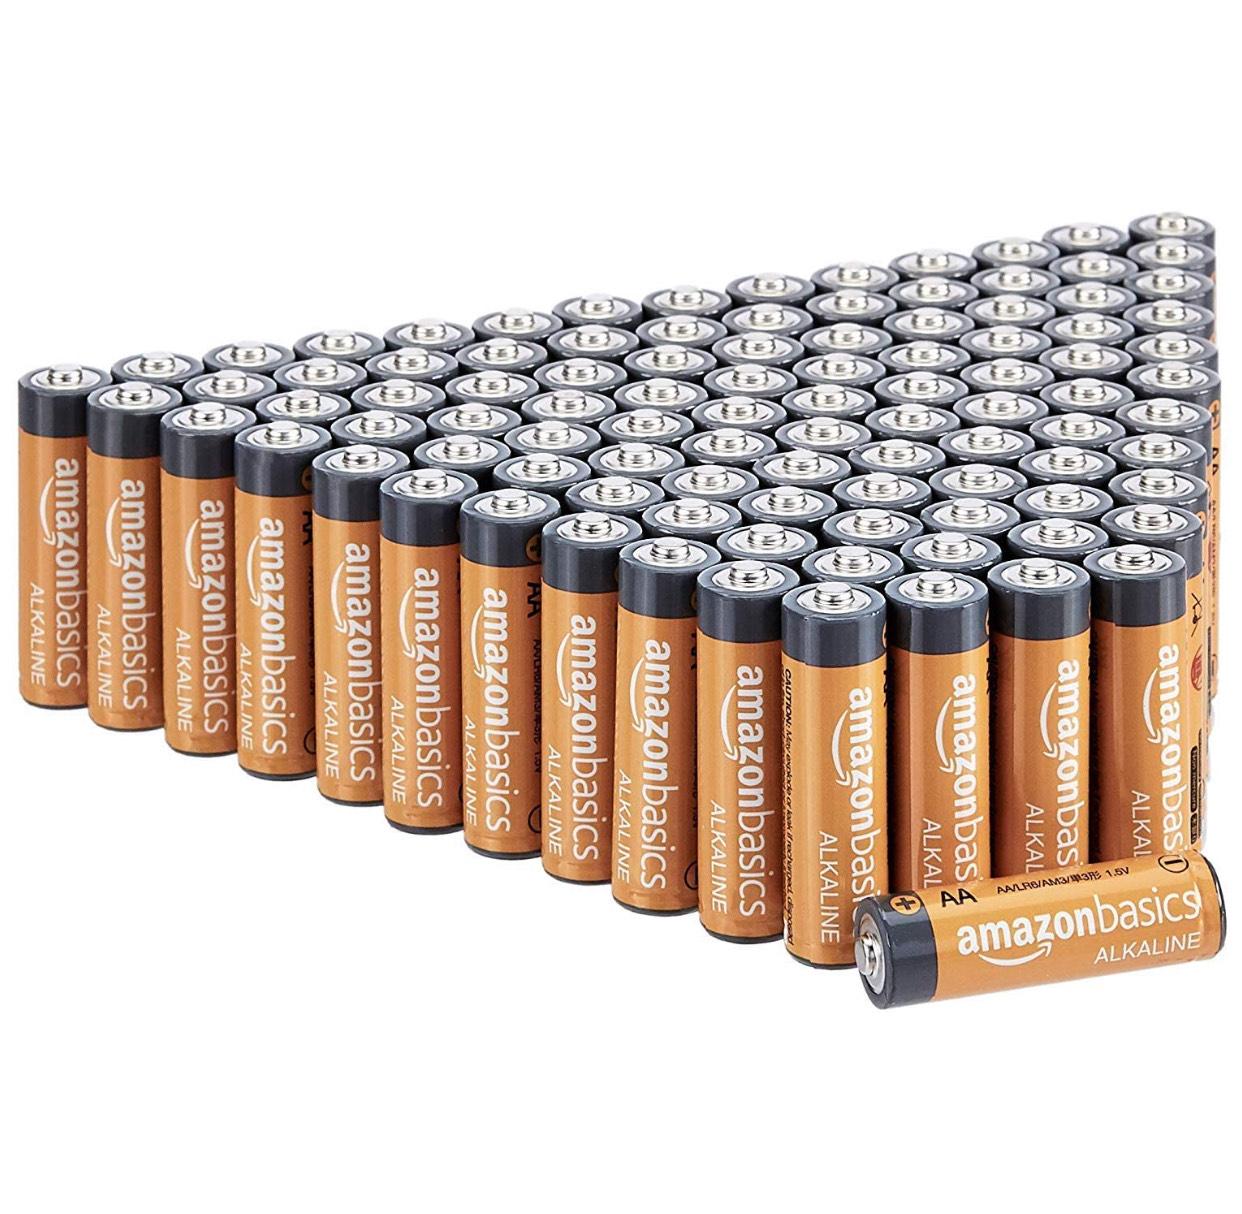 100 pilas alcalinas (promo 20% + compra recurrente)